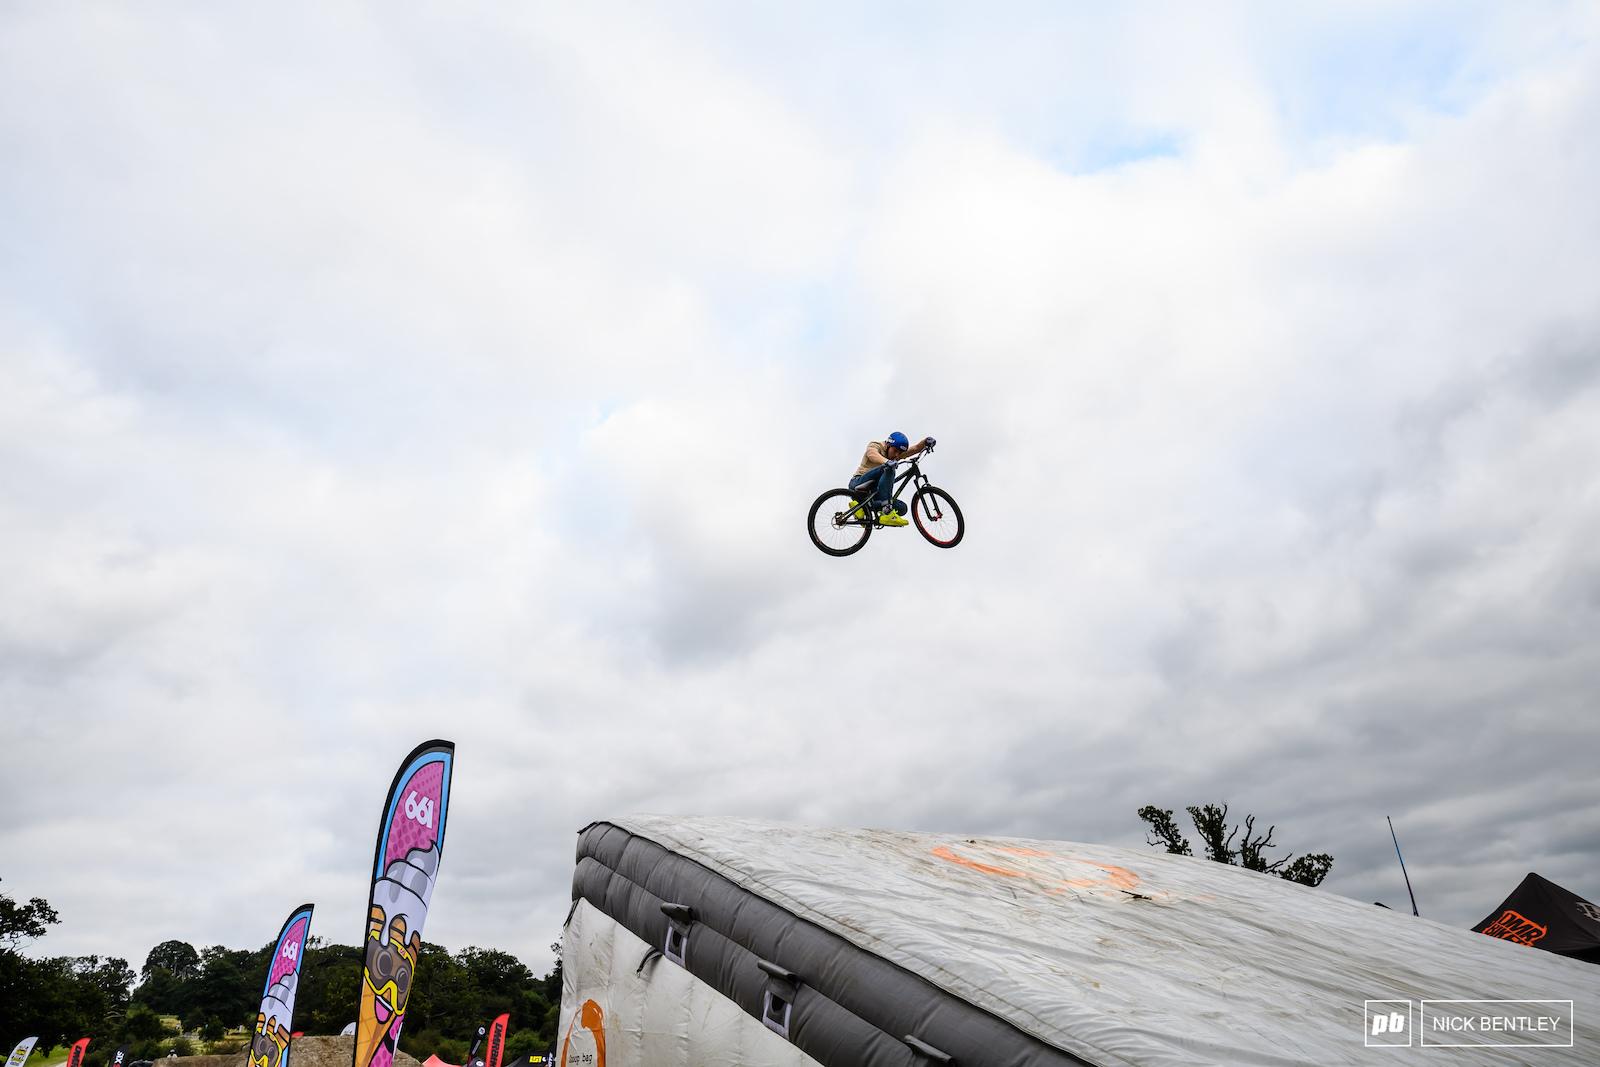 Finn Evans fully sideways and tucked in behind the bike